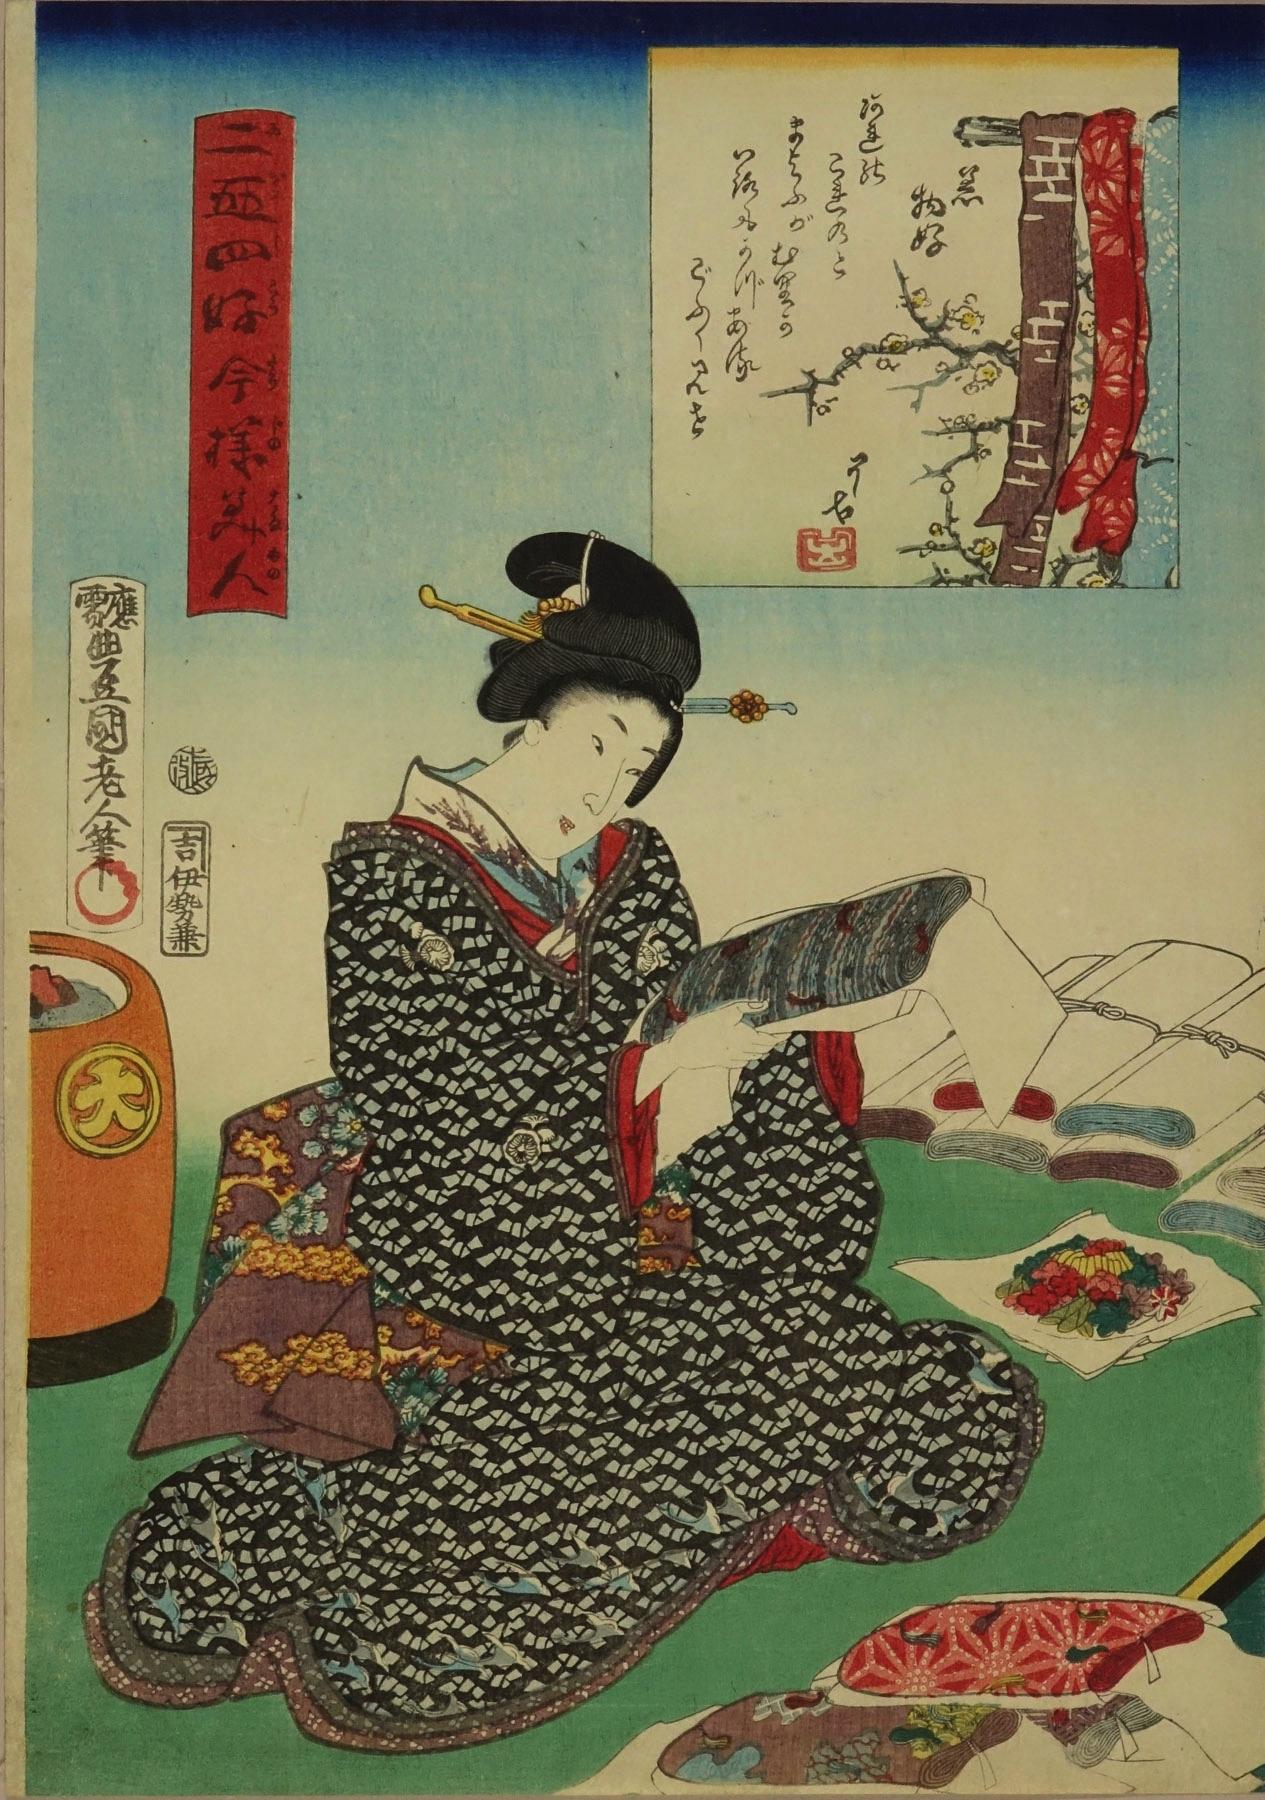 TOYOKUNI III <i>Kimono zuki</i> (Cloth lover), from <i>Nijushiko imayo bijin</i> (Modern beauties and twenty-four lovers)